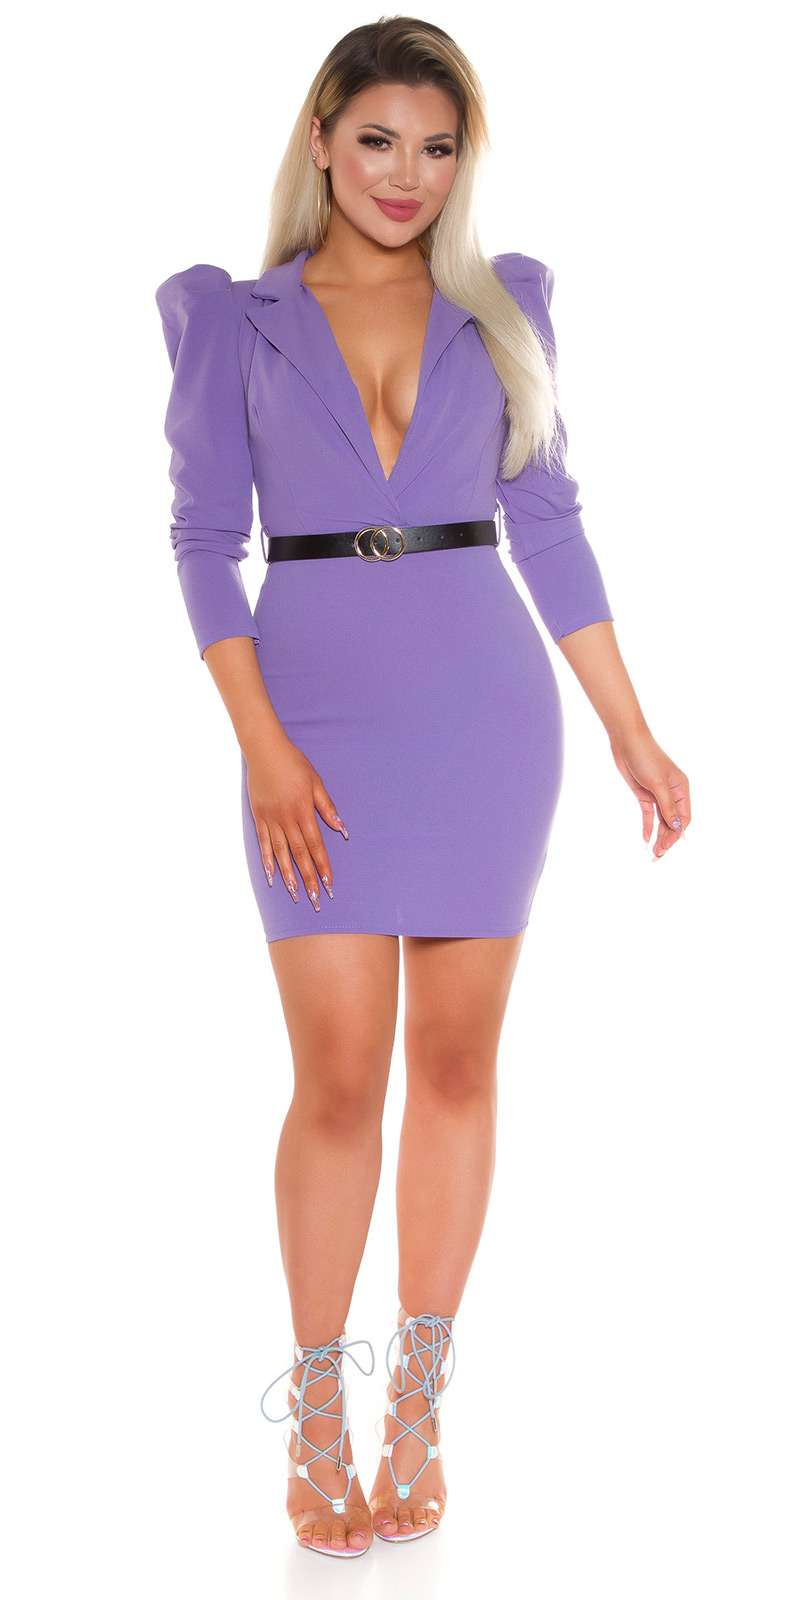 Minikleid mit Gürtel